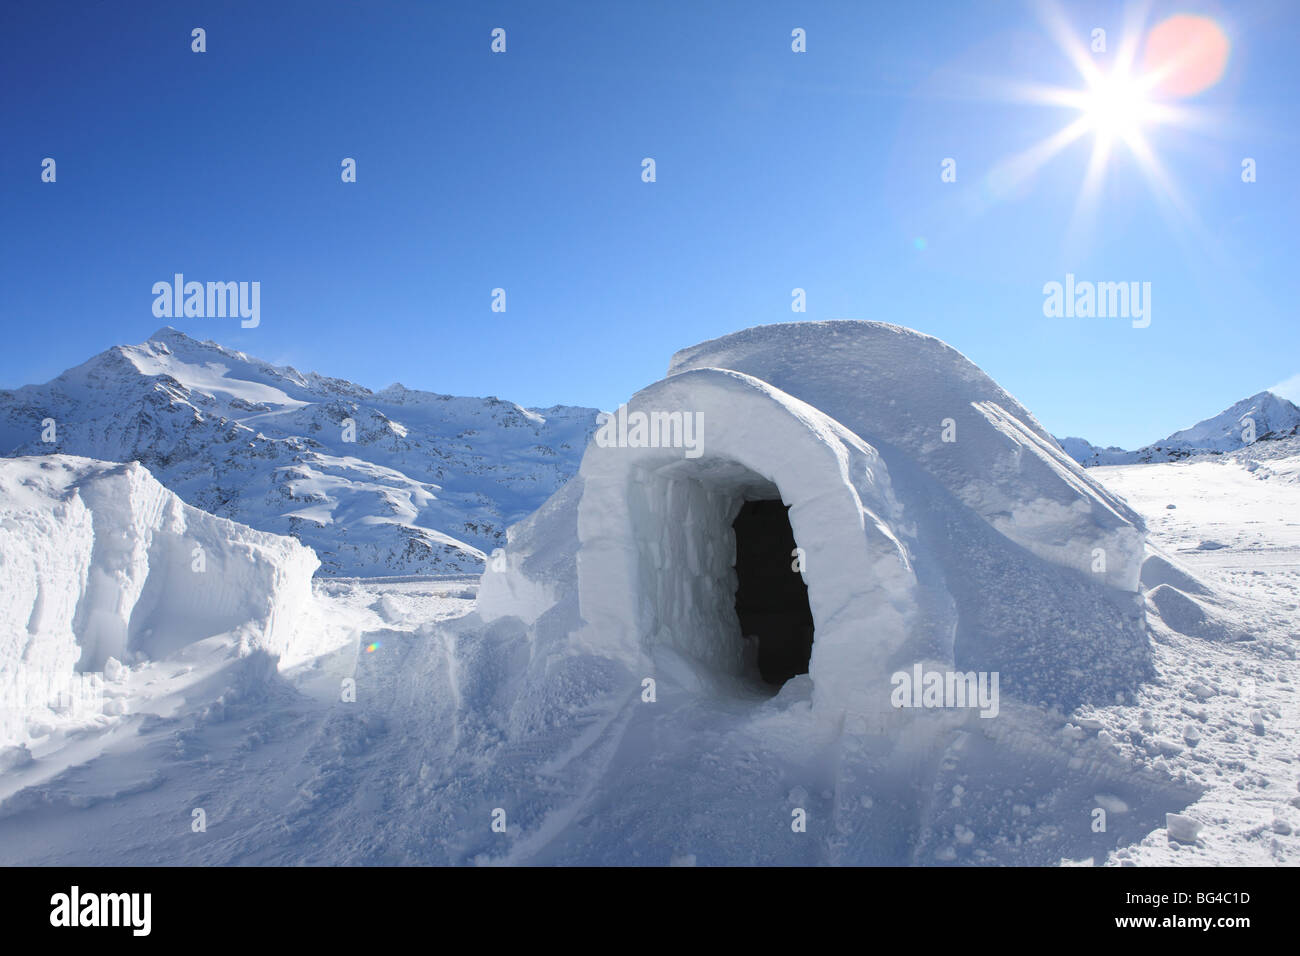 Igloo, Alps, Italy, Europe - Stock Image